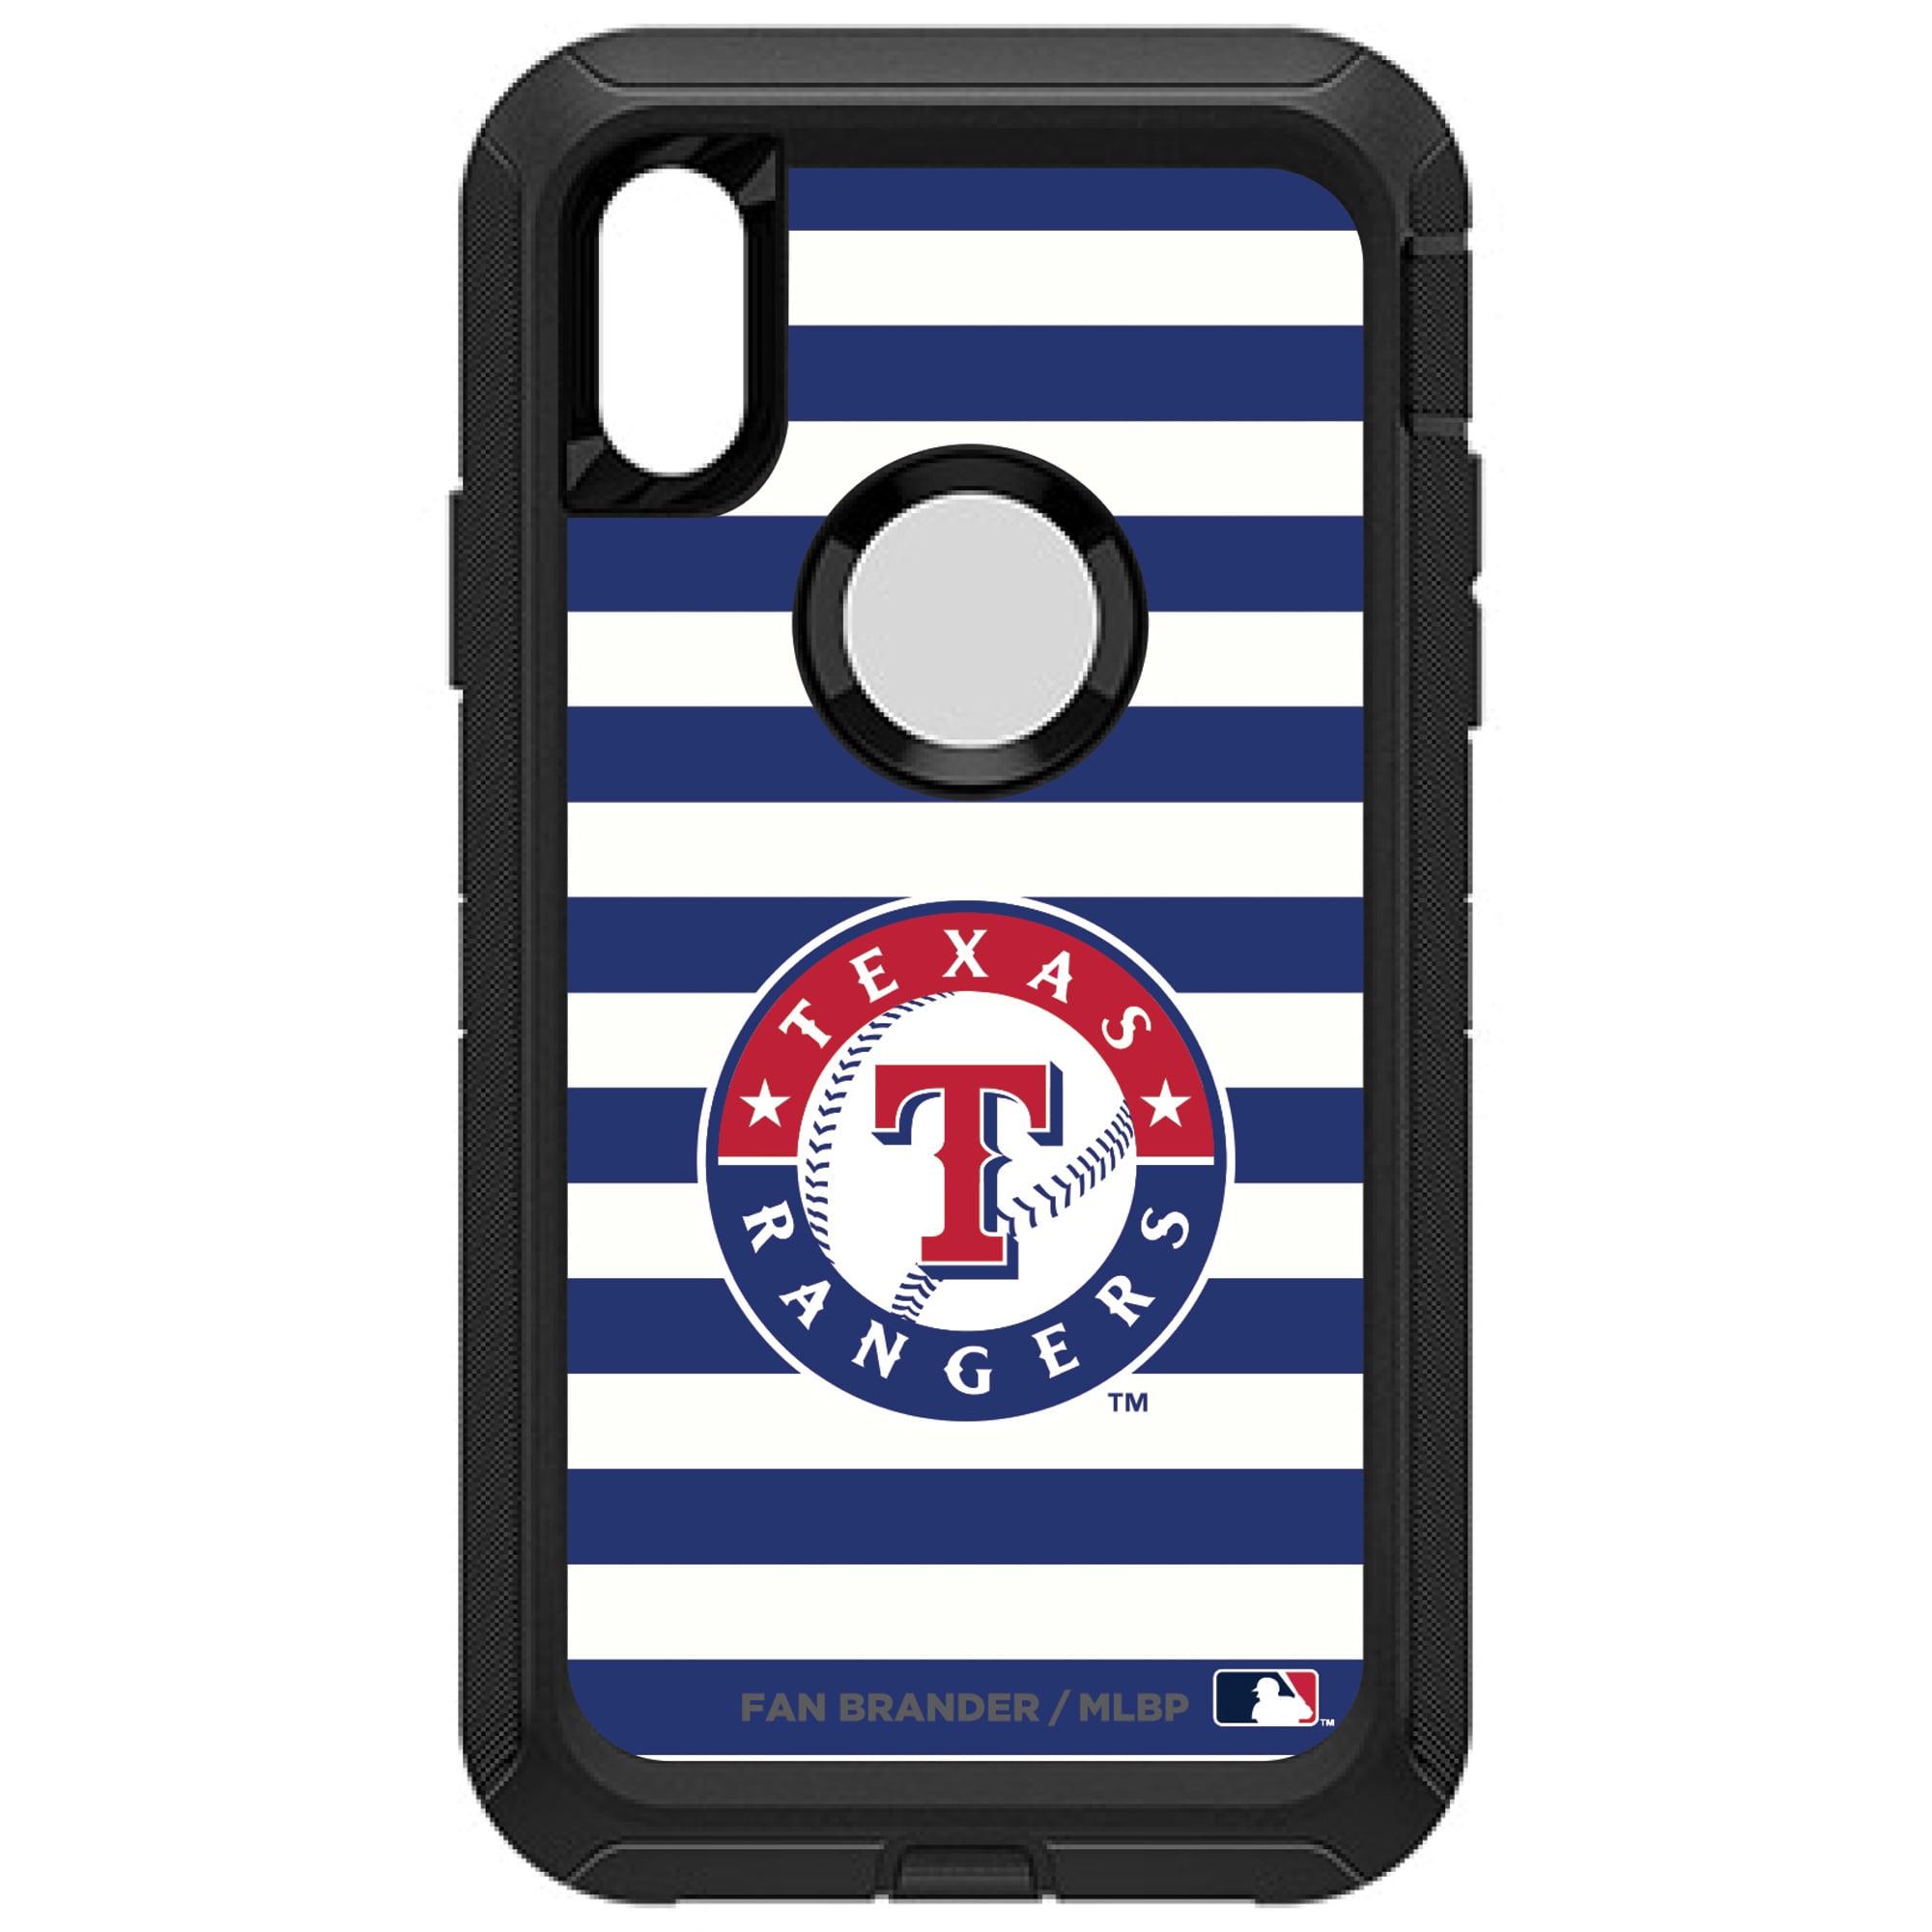 Texas Rangers OtterBox iPhone Screenless Defender Case